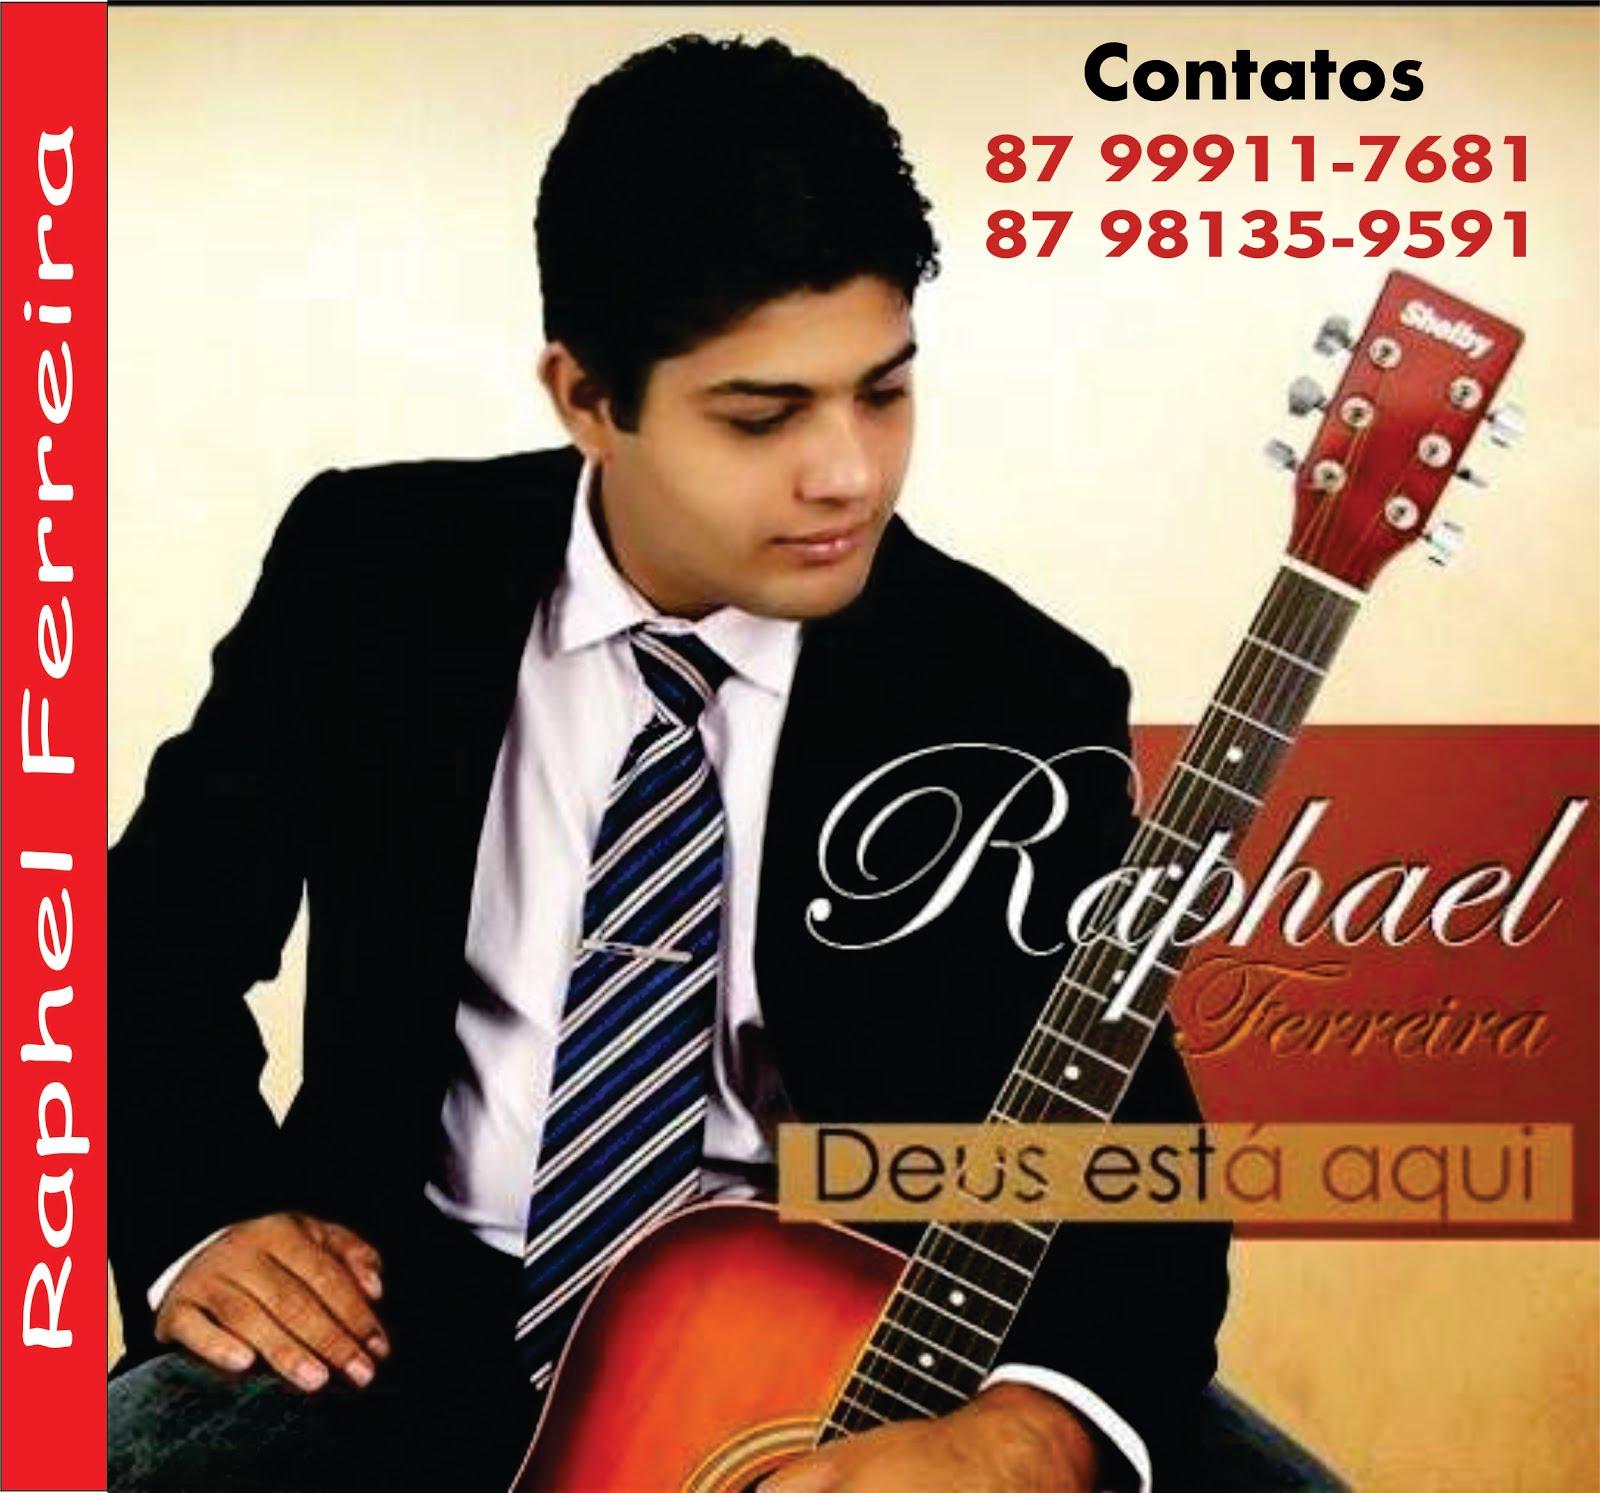 Cantor Raphel Ferreira